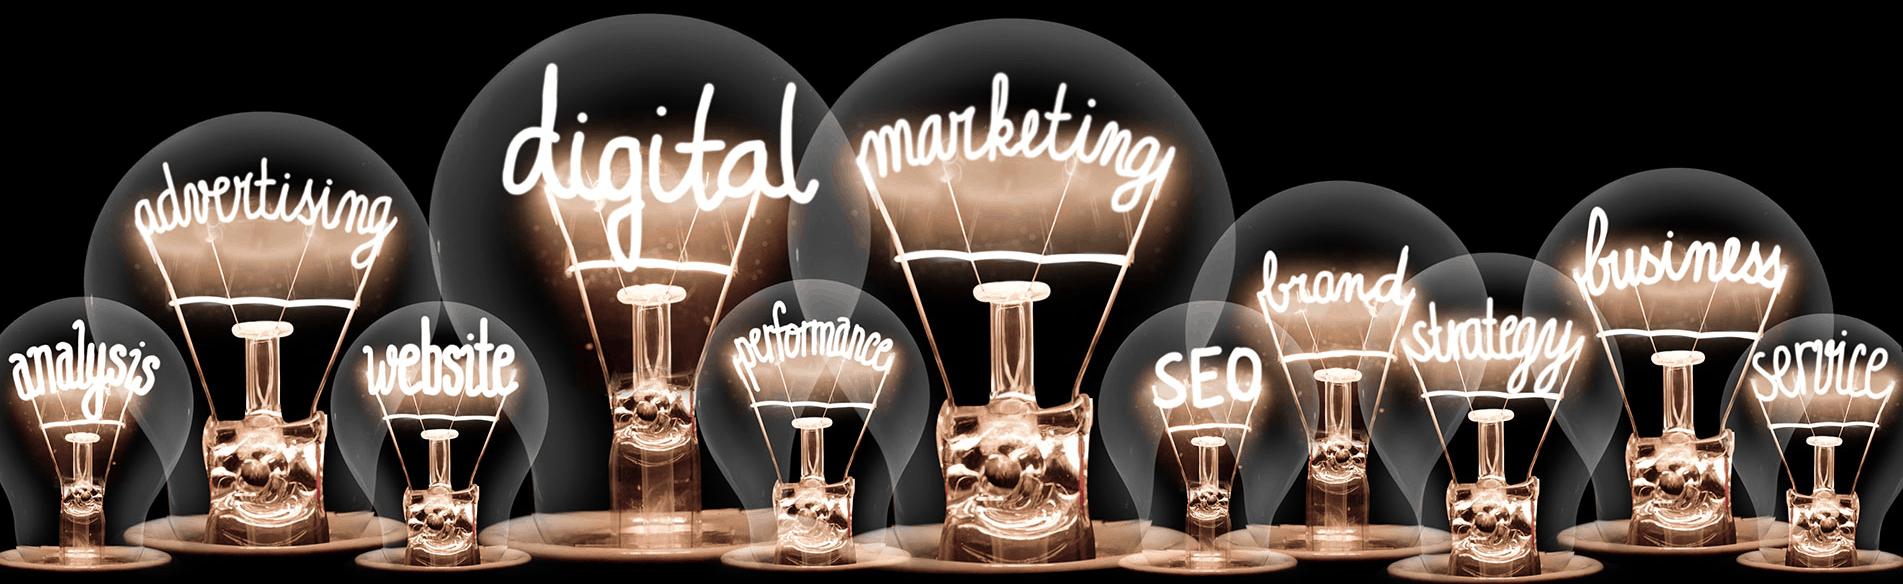 lightbulbs with digital marketing terms